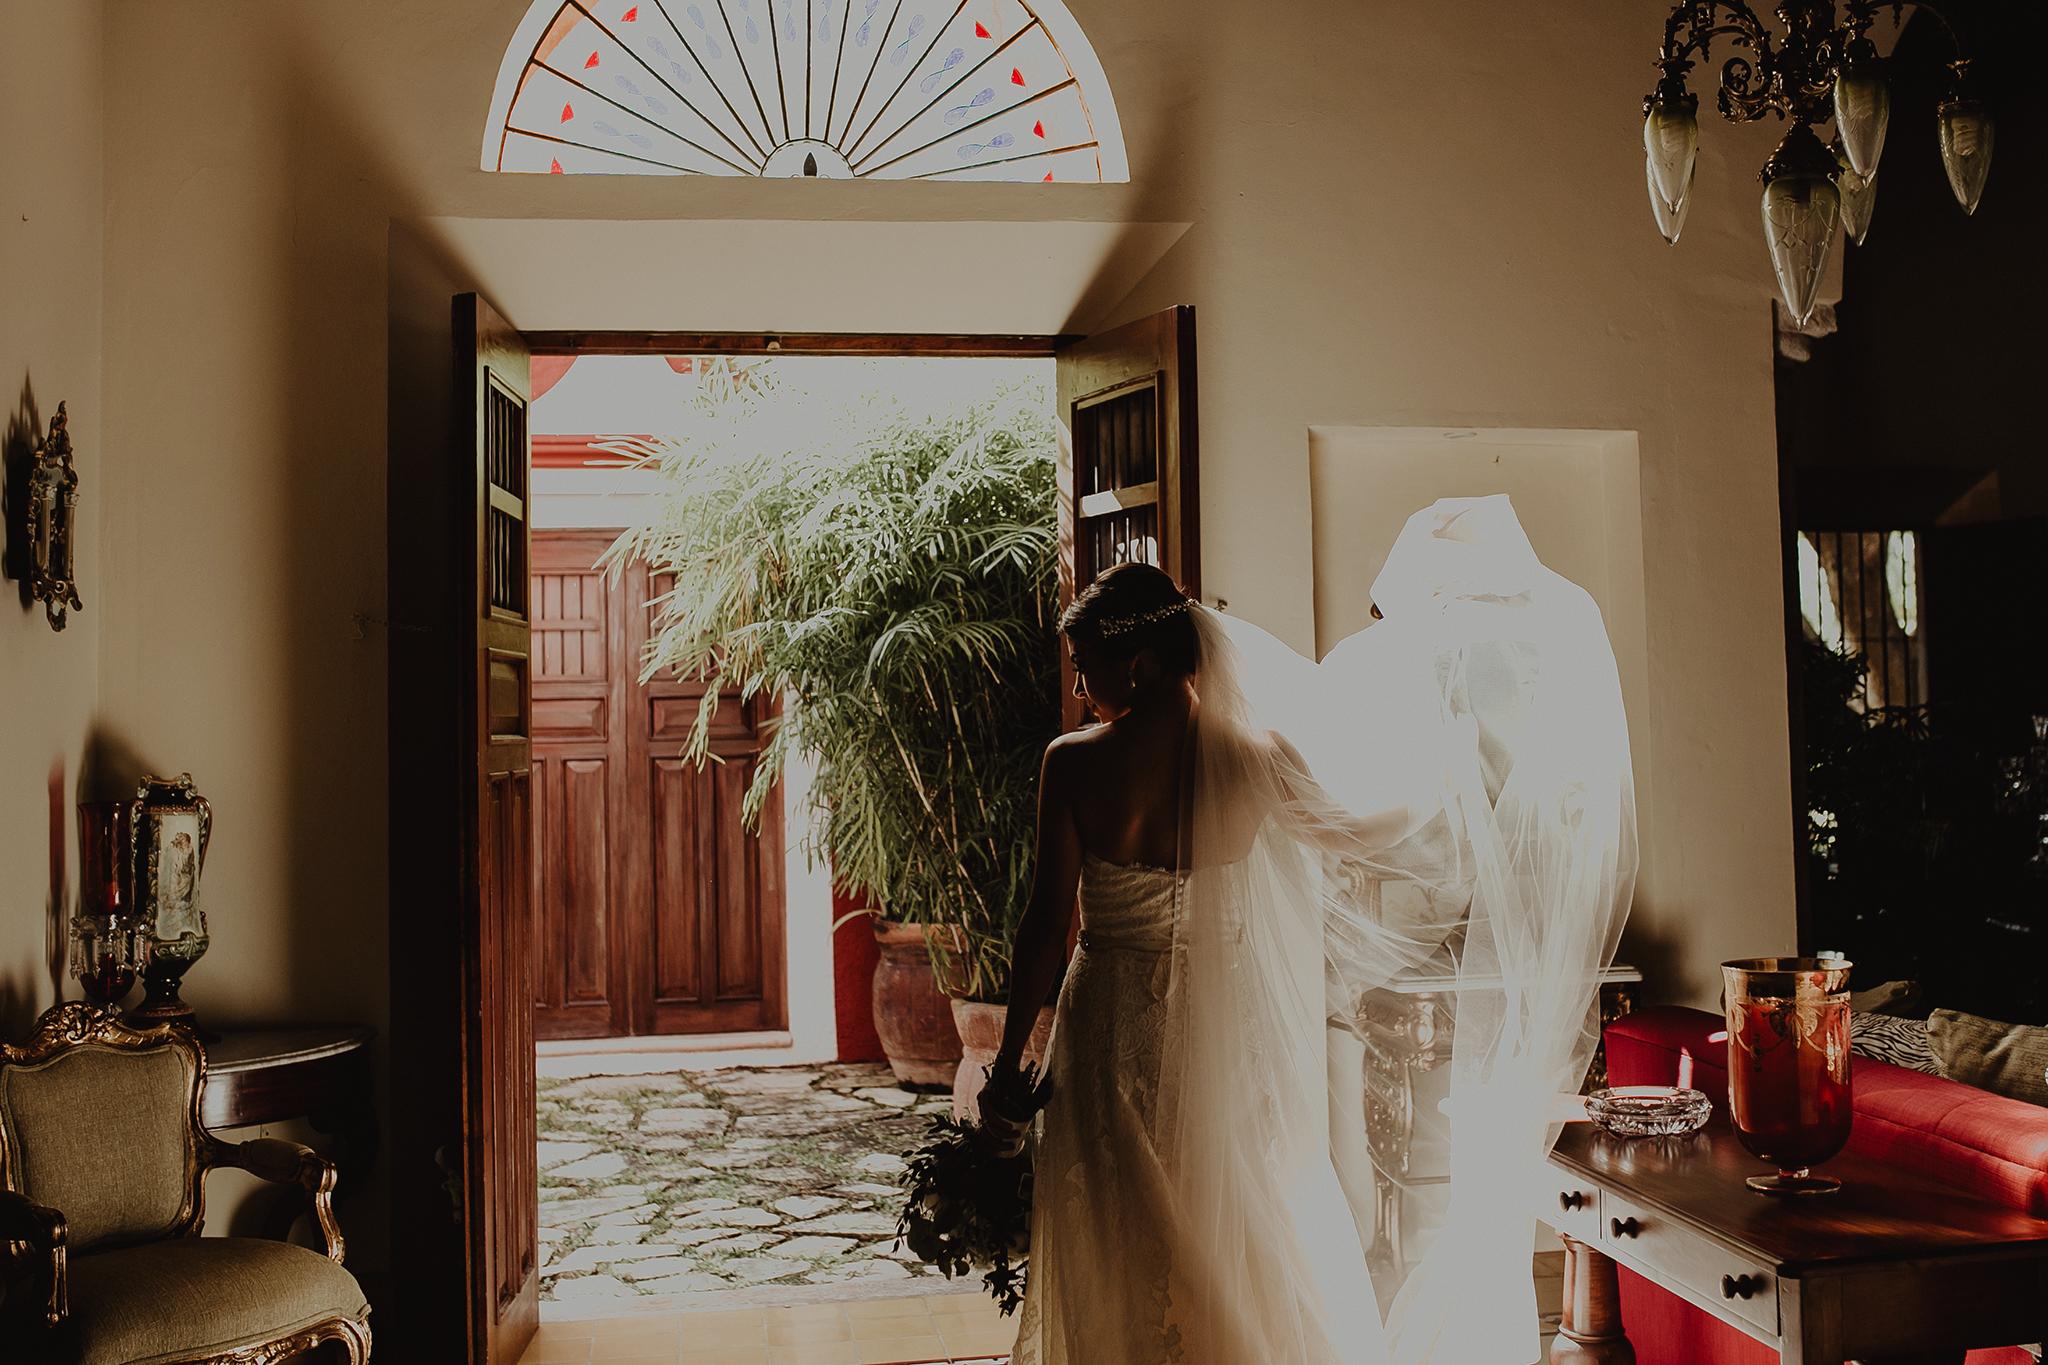 0147F&Yslide_WeddingDstination_MeridaYucatan_HaciendasMerida_BodasMexico_BodasYucatan_Boda_Destino.jpg